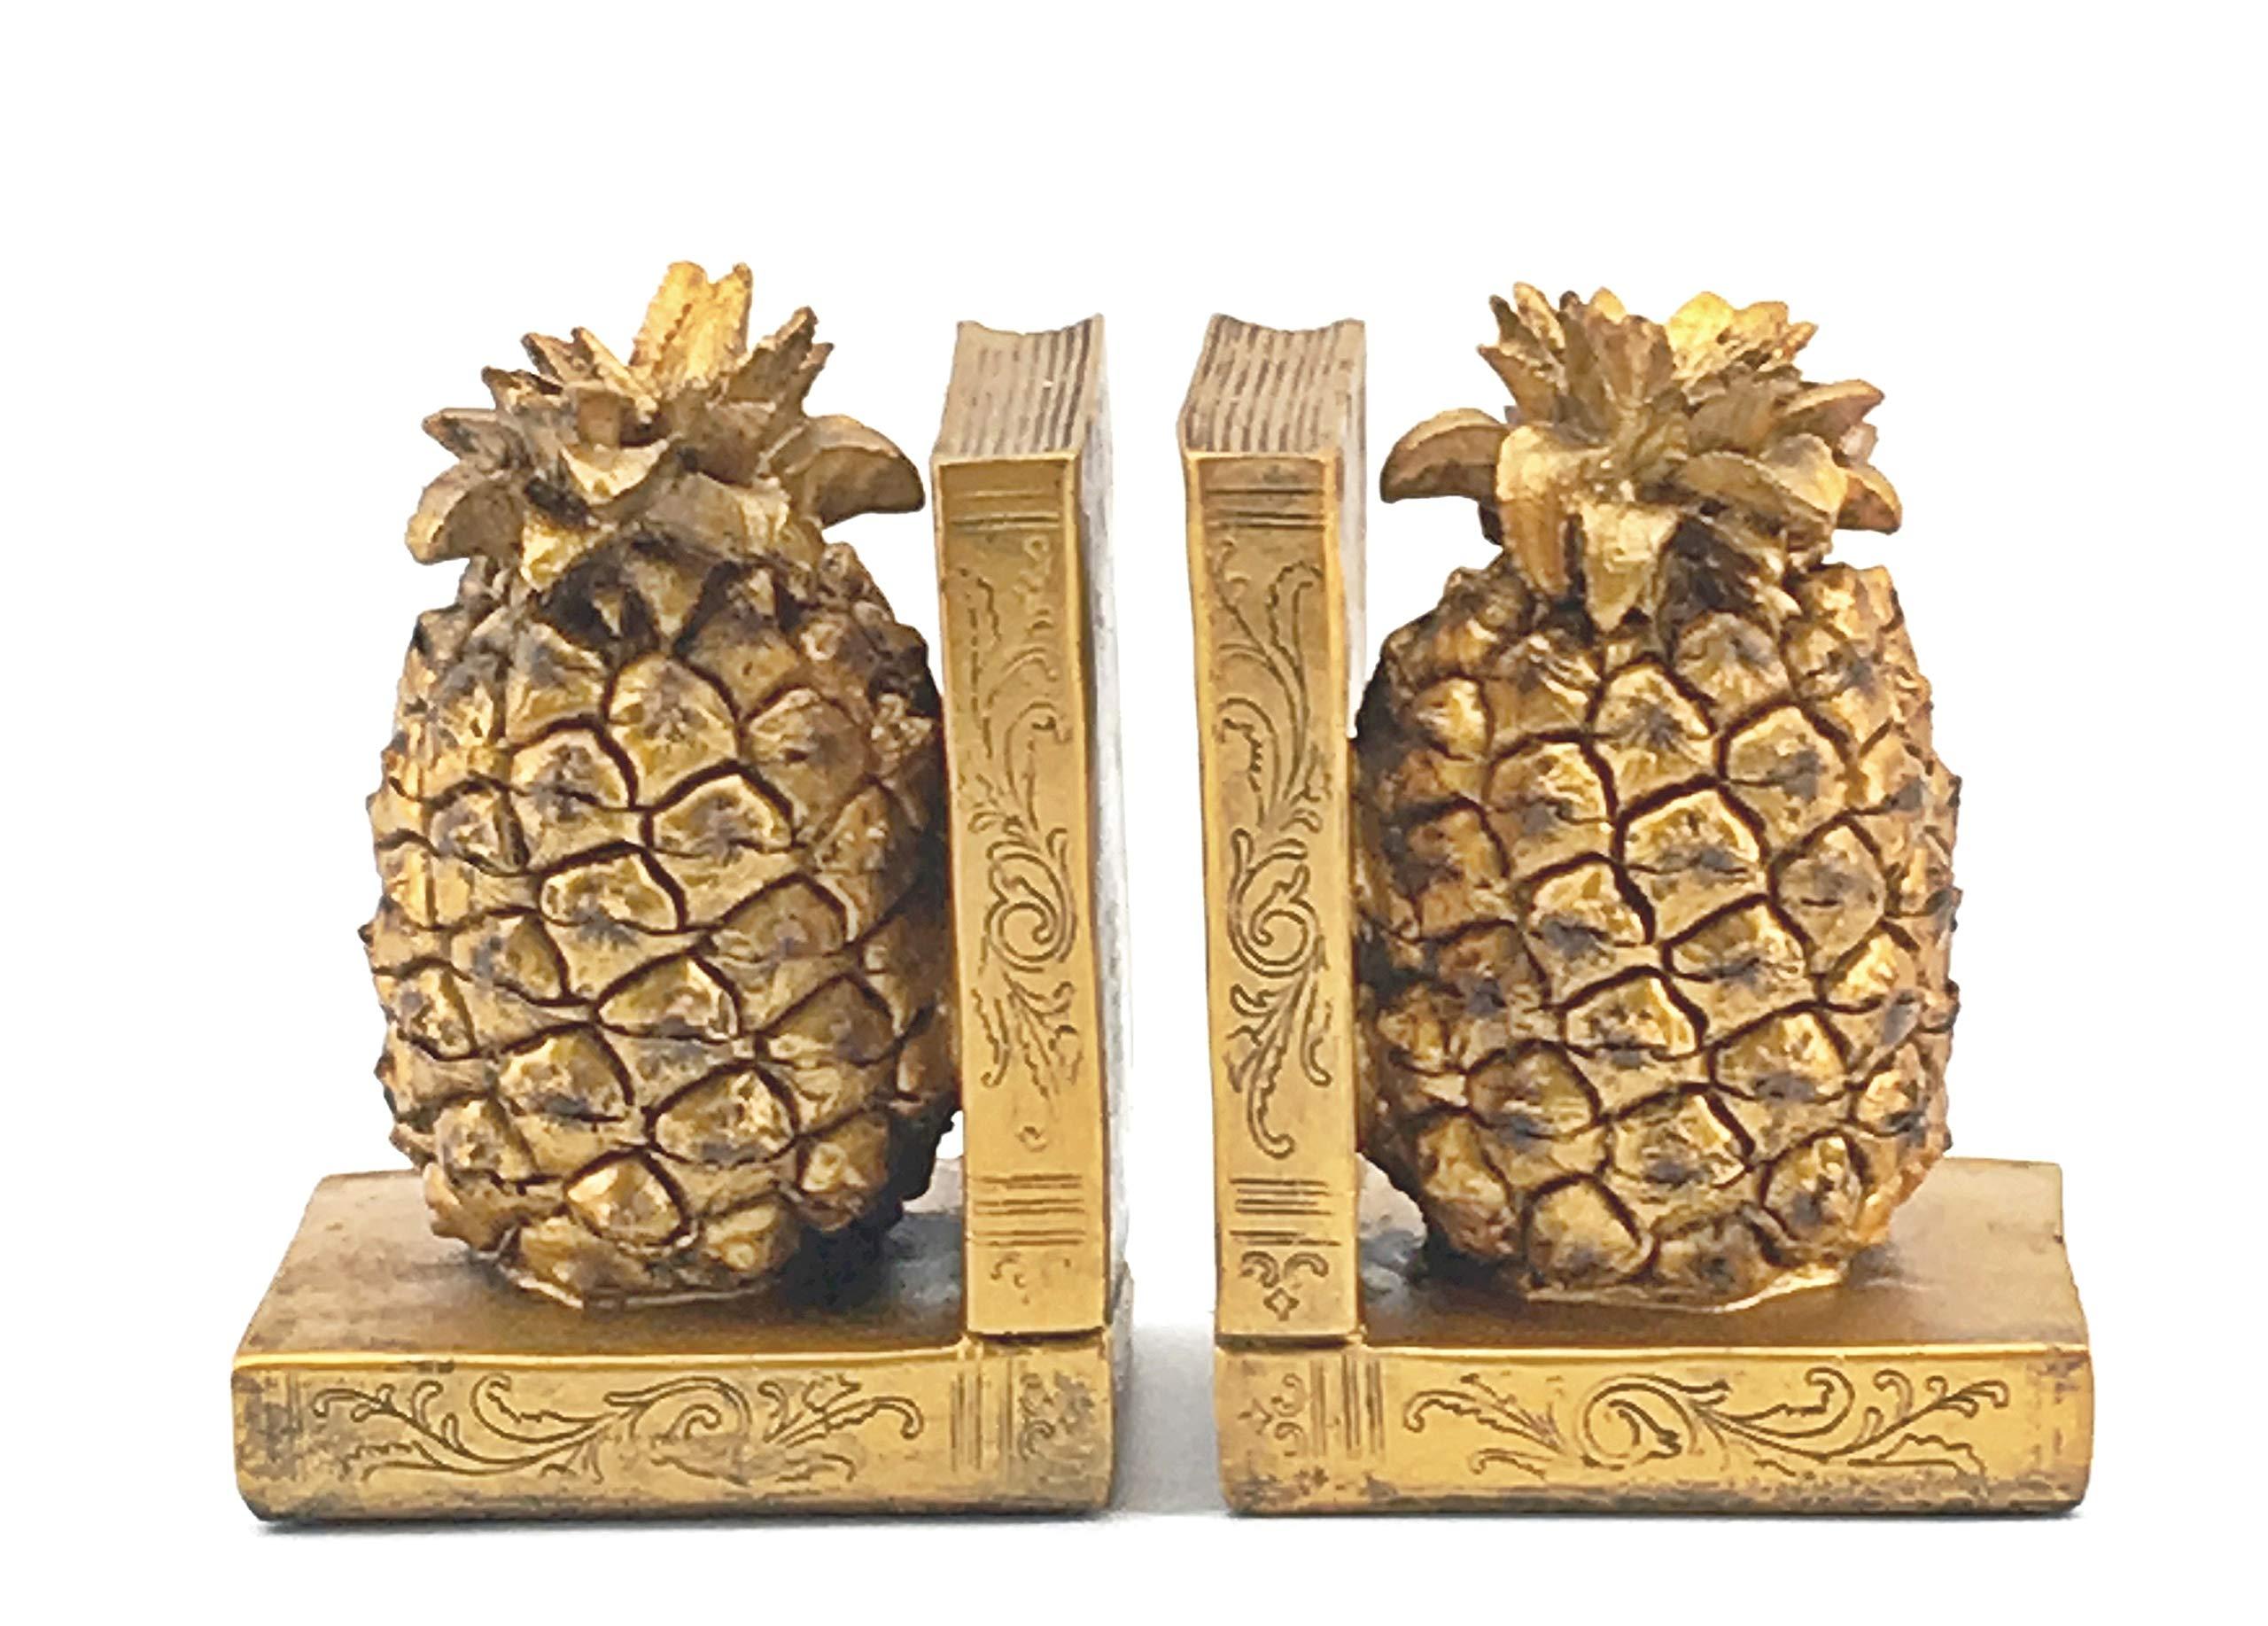 Bellaa 24162 Pineapple Bookends Golden Bookshelves Decor 6.5'' Tall